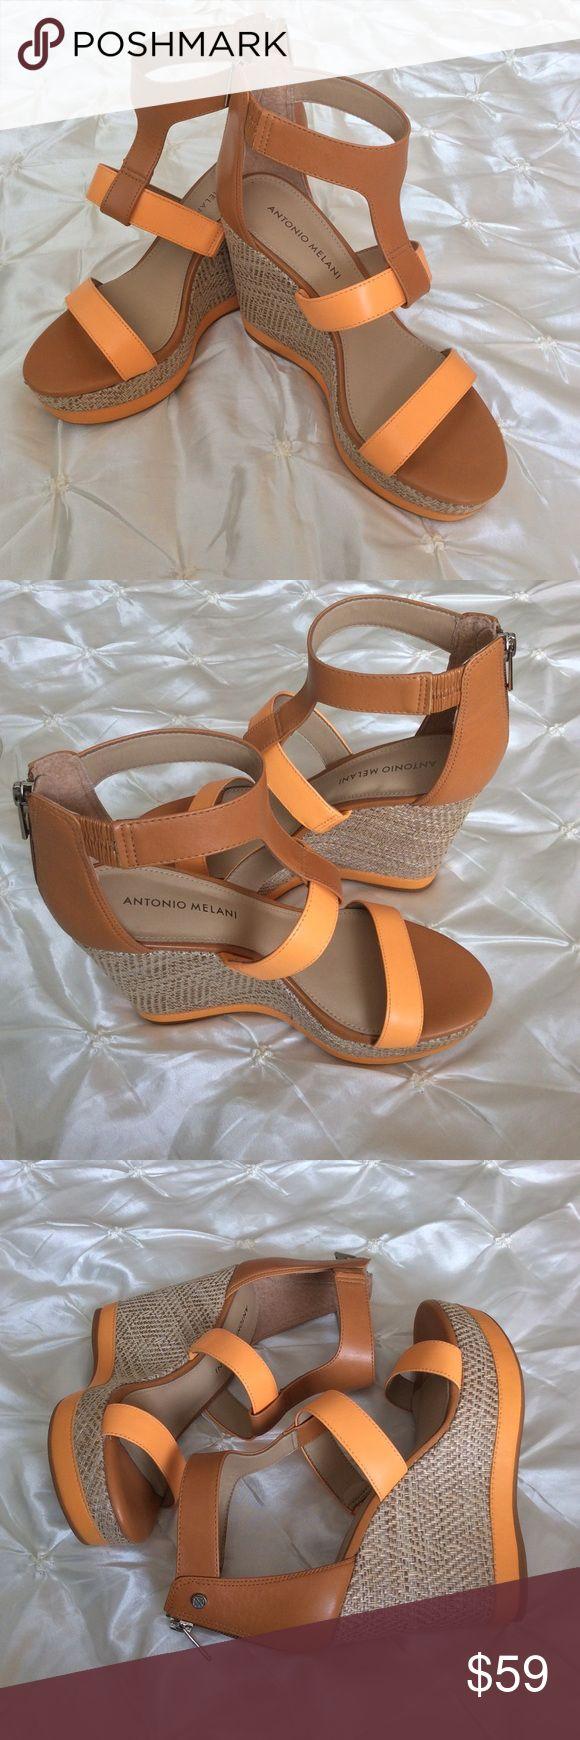 "ANTONIO MELANI High Wedge Backstrap Sandals Beautiful tan and orange wedges by Antonio Melani! Leather upper! 4.5"" heels 1.5"" platforms. Made in Brazil.  ANTONIO MELANI Shoes Wedges"